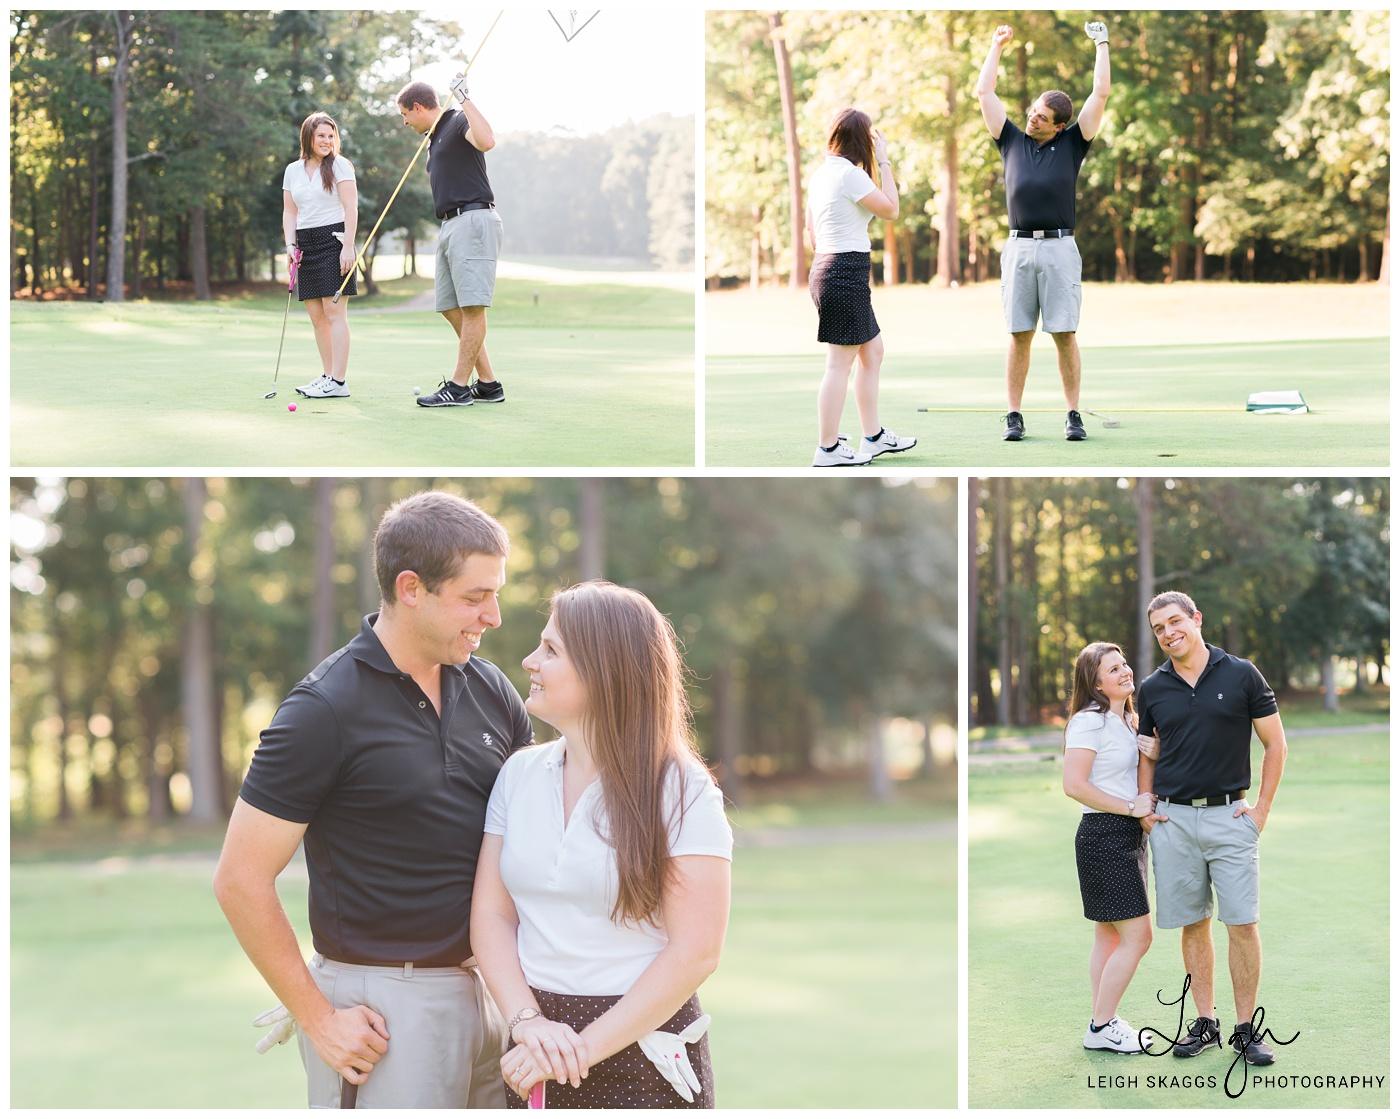 Nicole & Eric   Newport News Golf Club at Deer Run Engagement